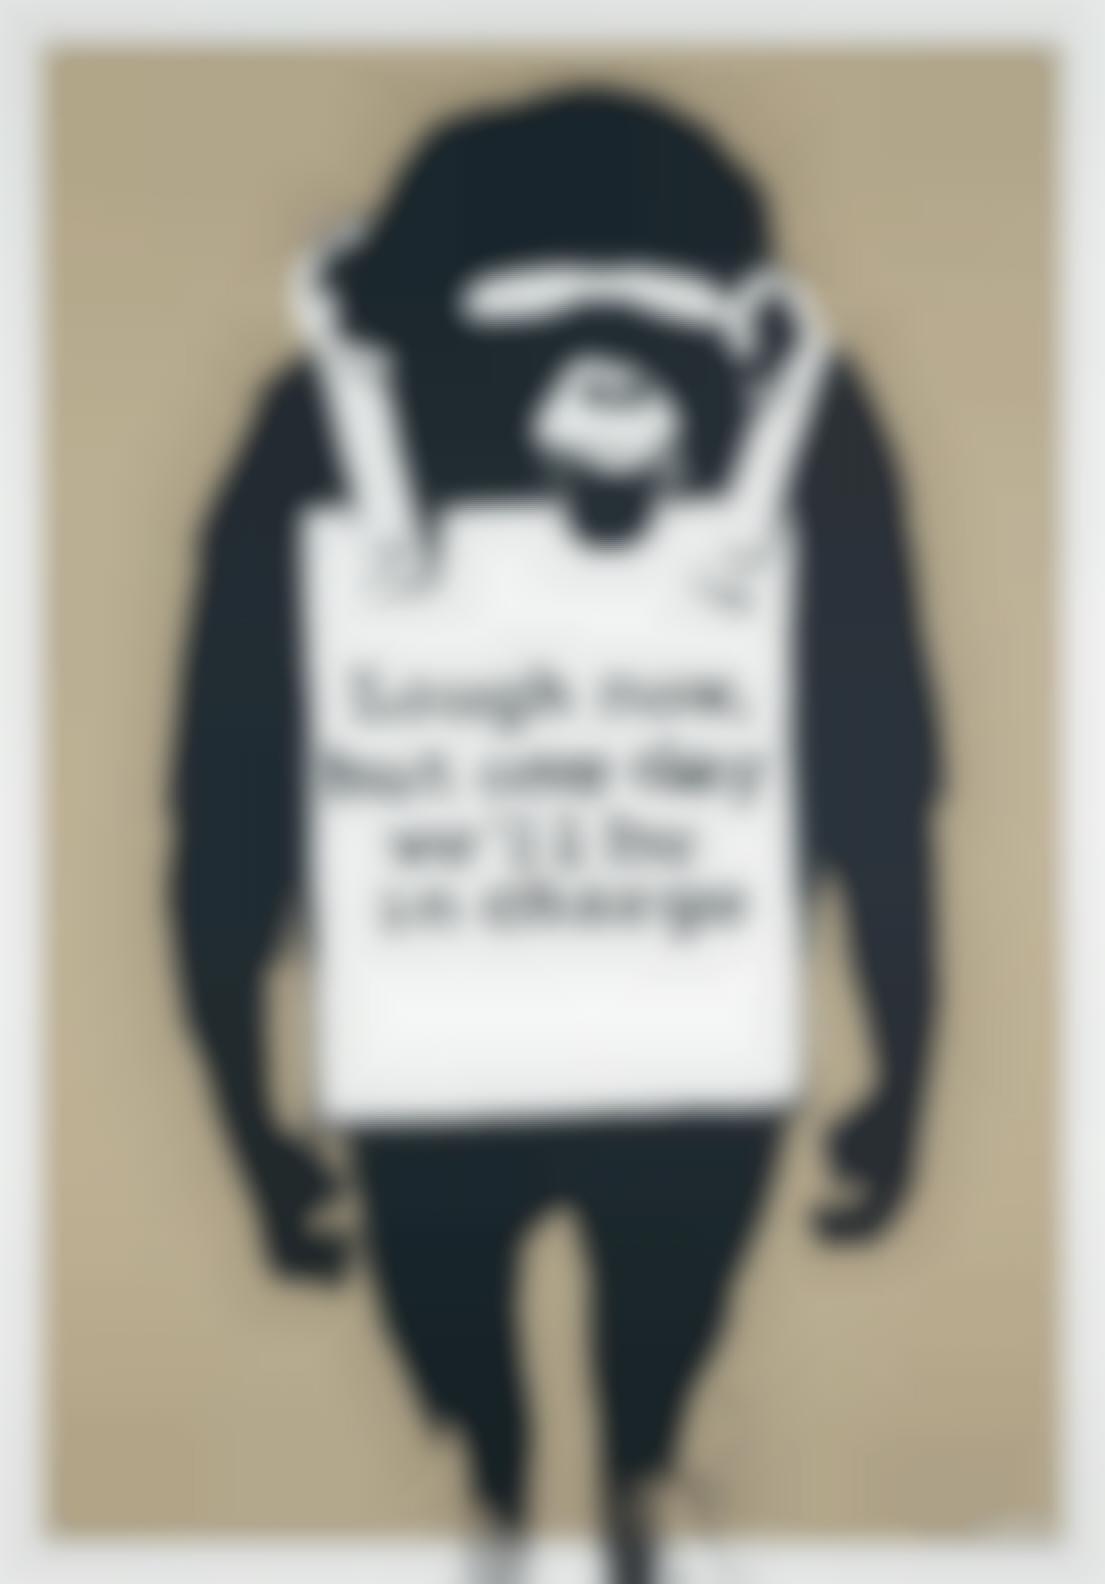 Banksy-Laugh Now-2003